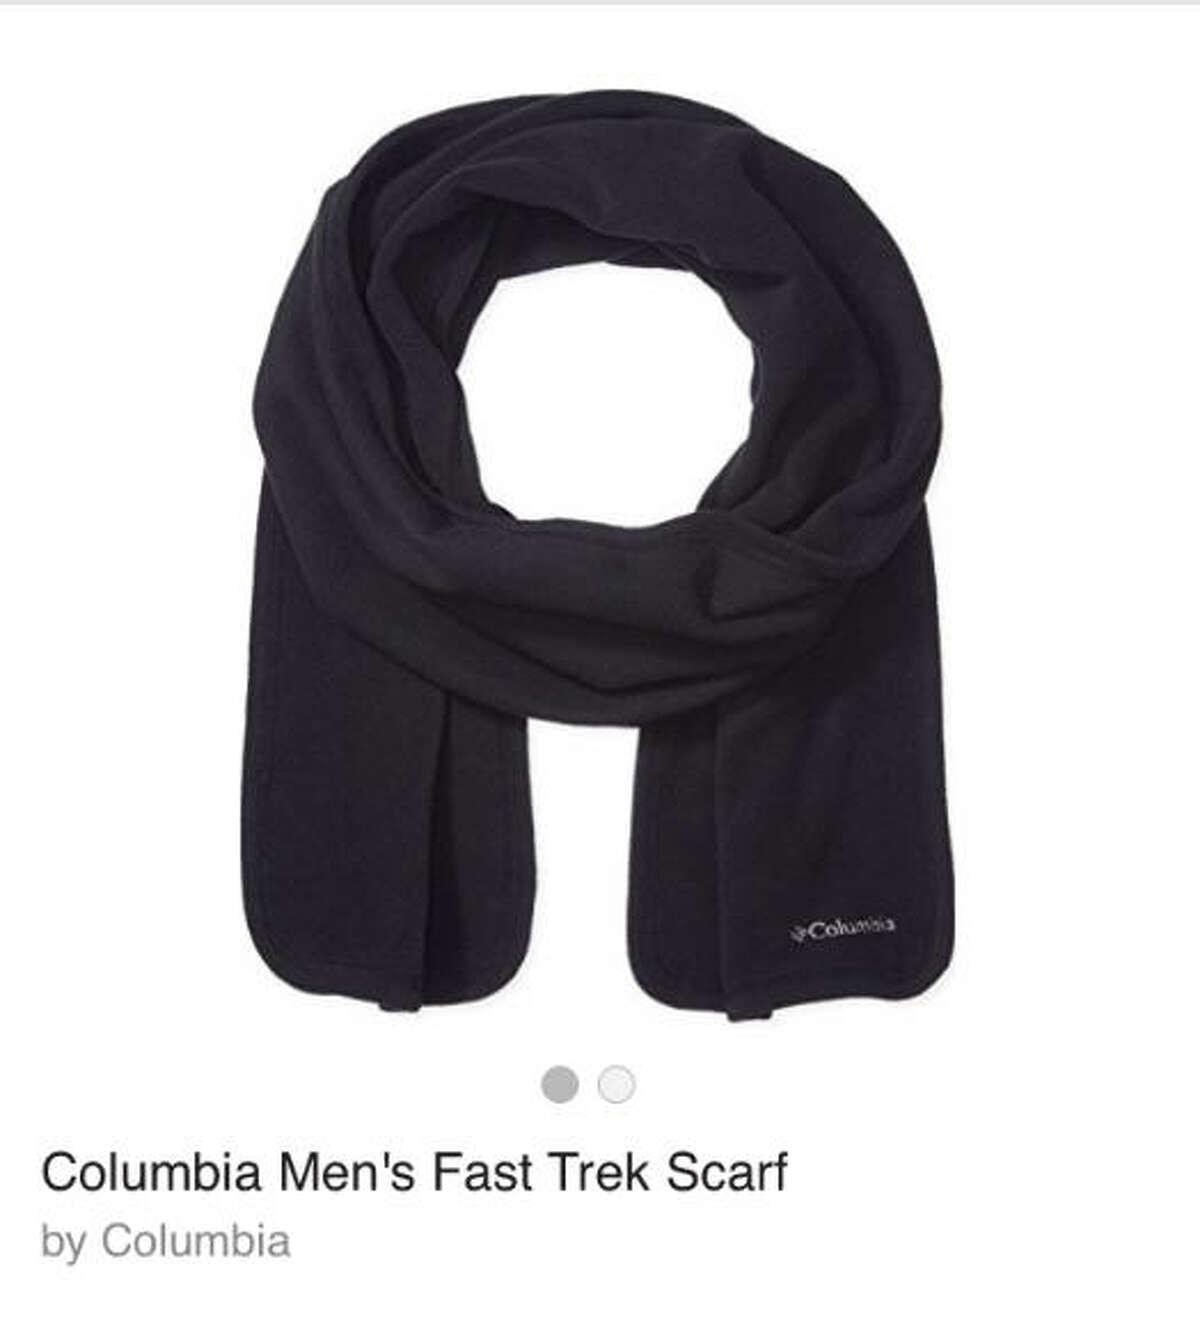 Columbia Men's Fast Trek Scarf $14 Find it here.